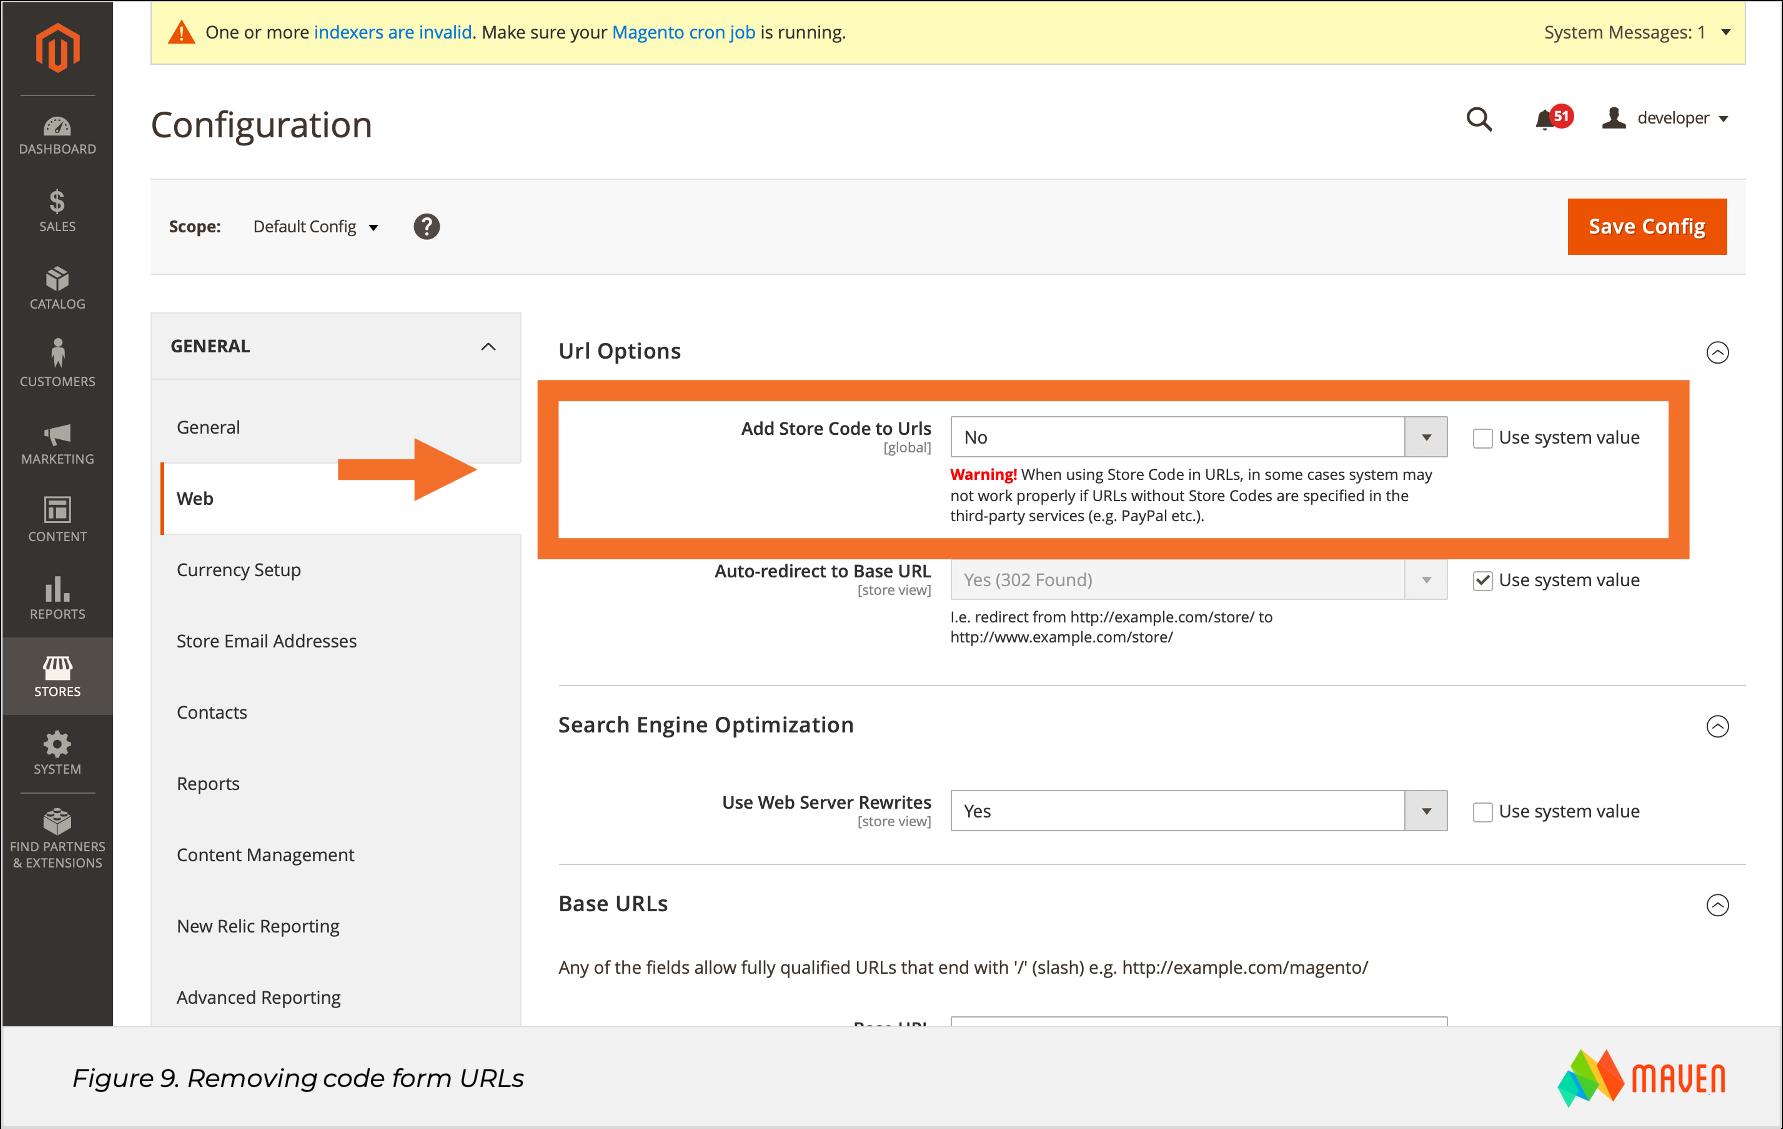 Magento SEO Figure 9 Removing code form URLs